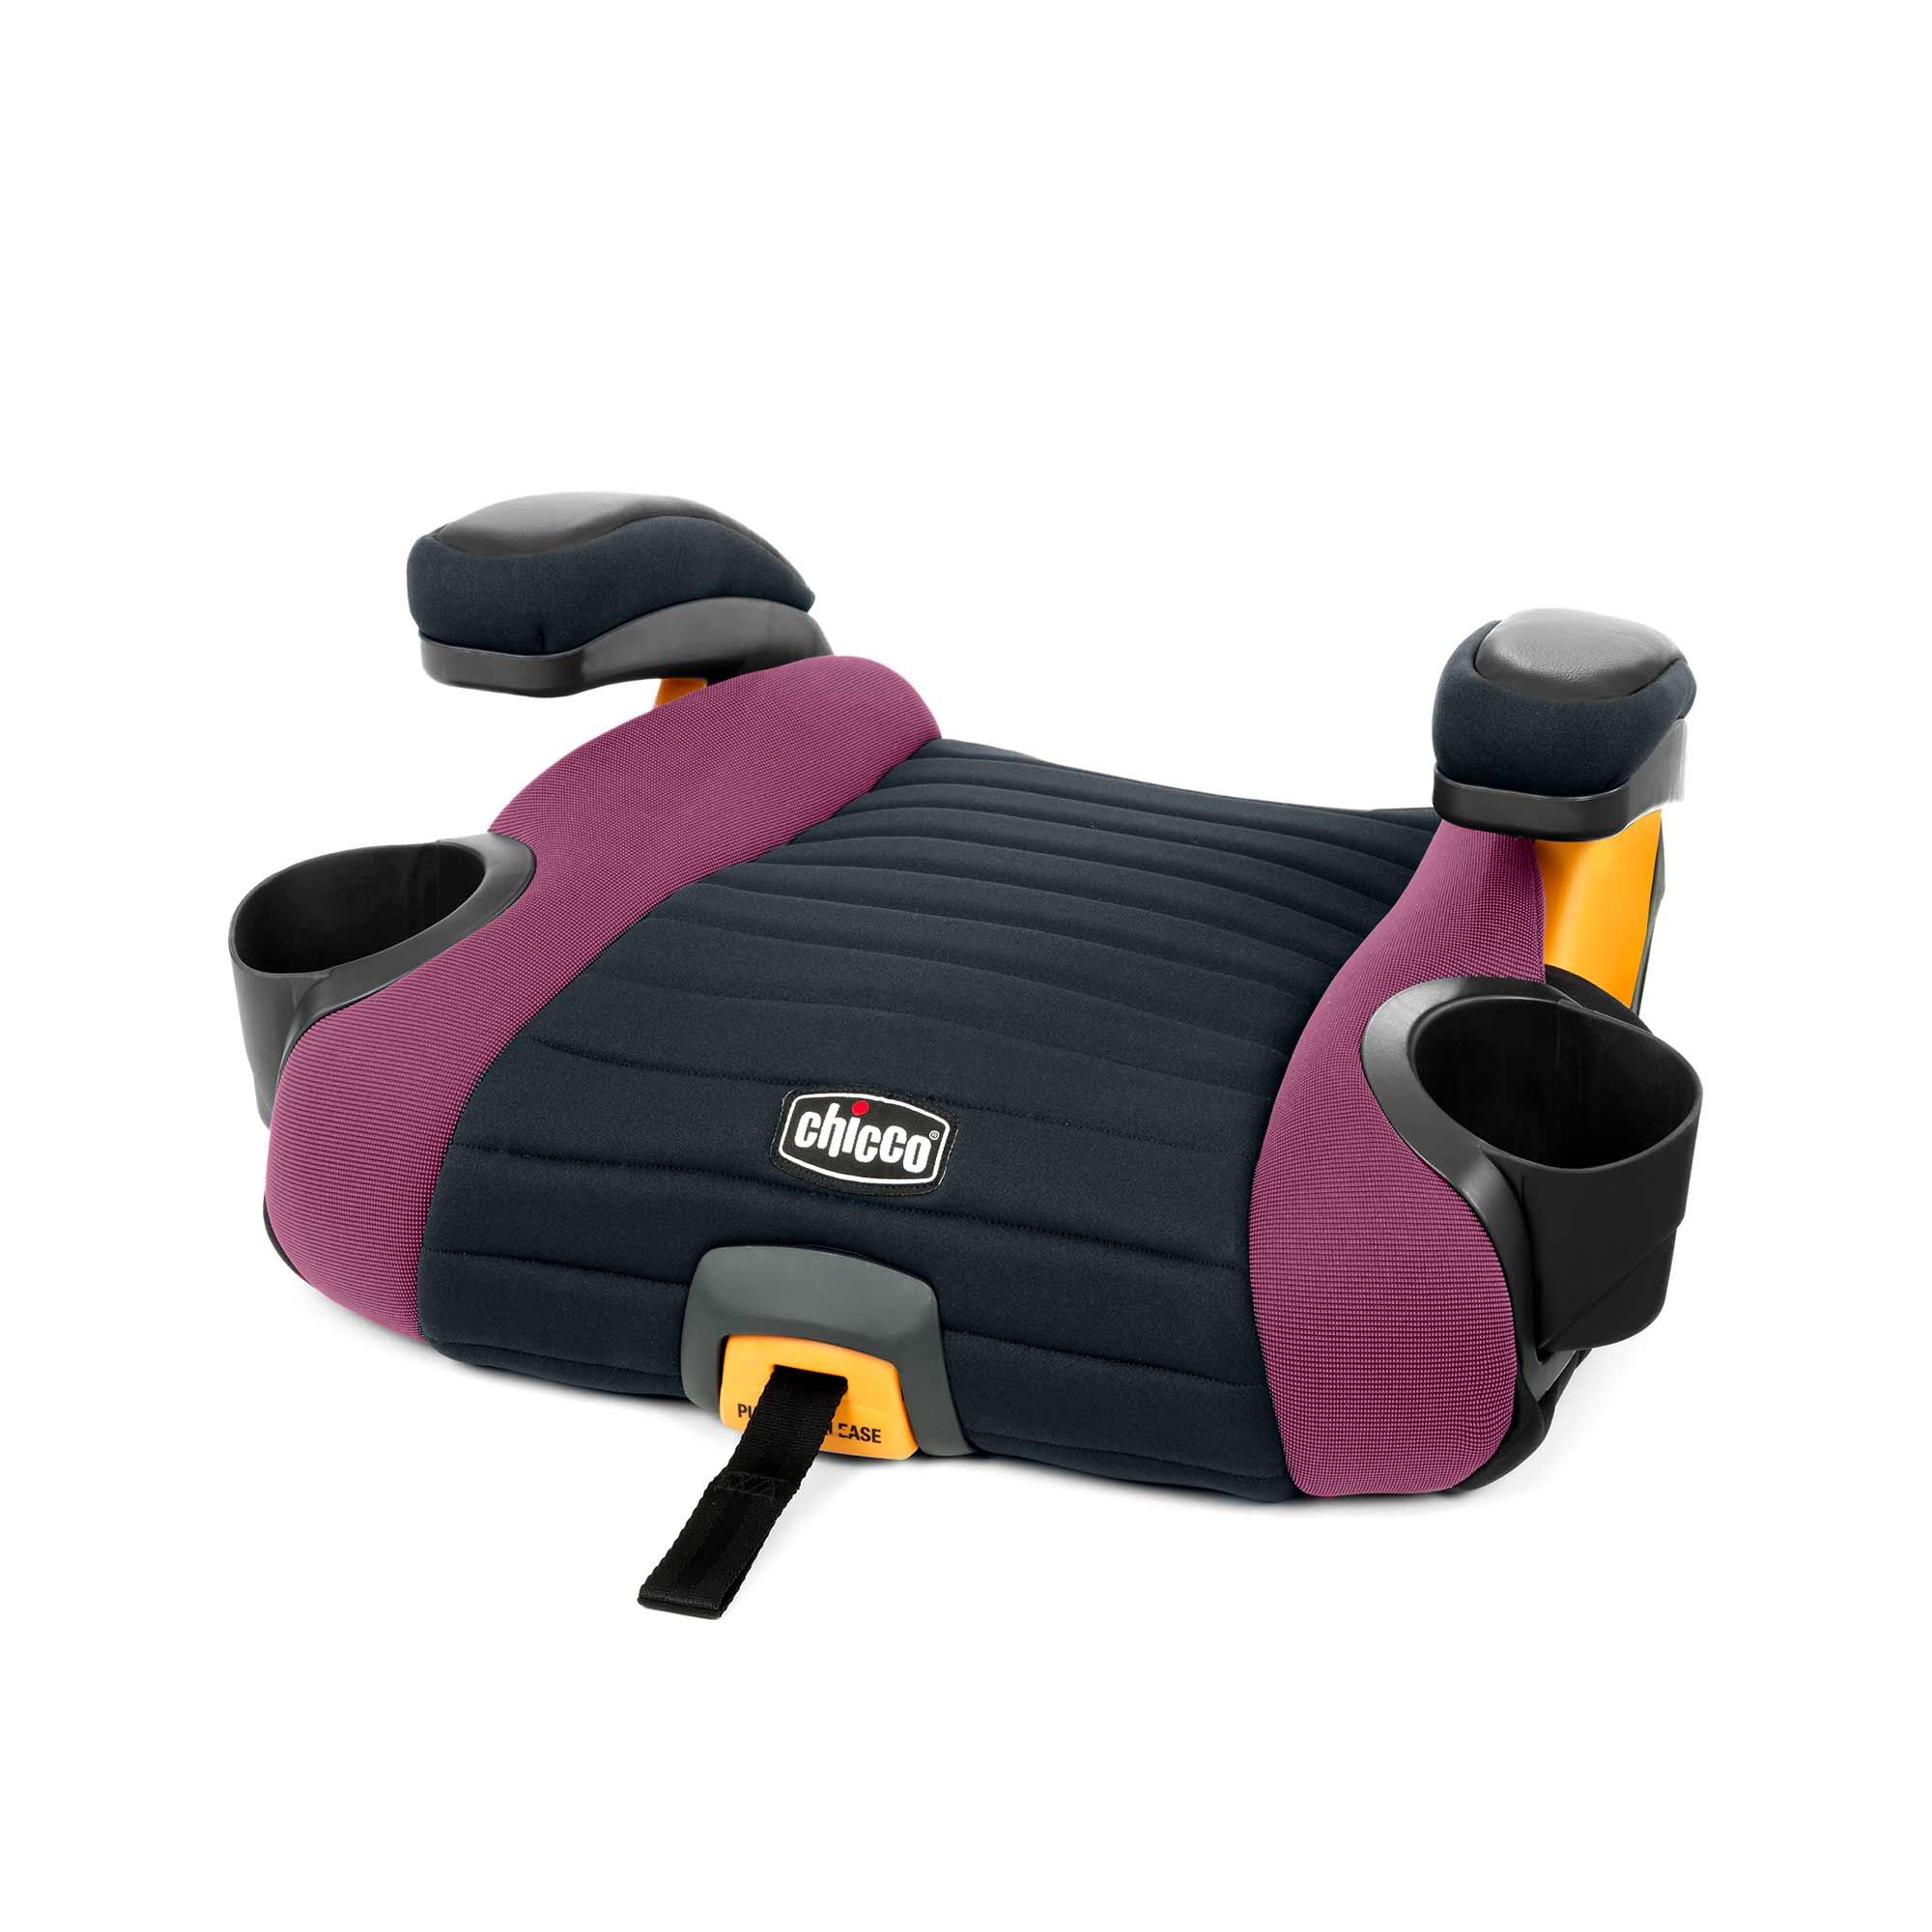 GoFit Plus Booster Car Seat - Vivaci | Chicco